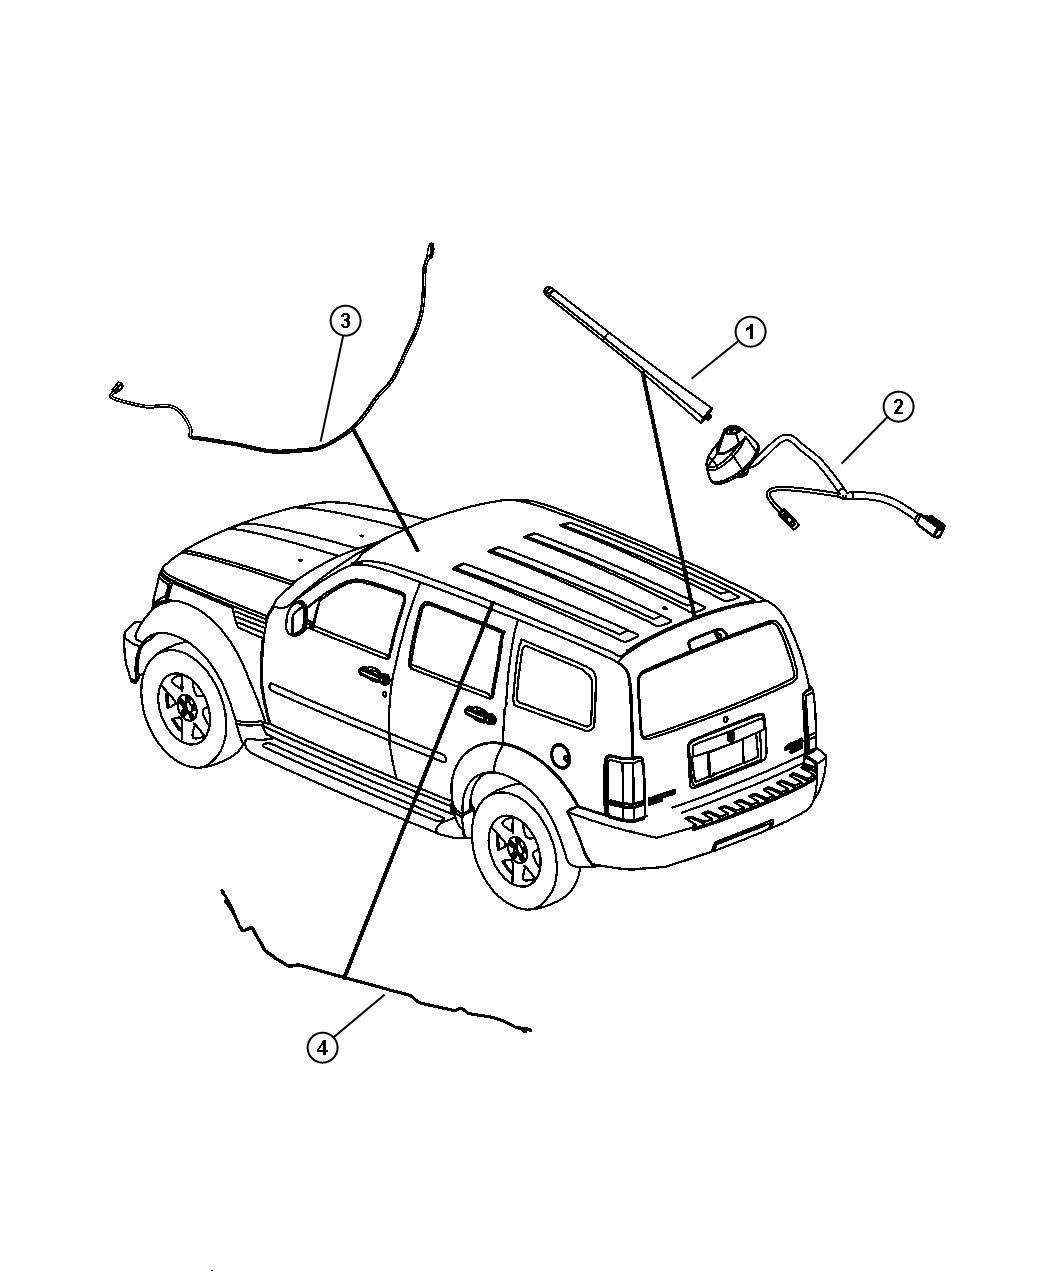 2007 Dodge NITRO Mast. Antenna. [rdb]. Radio, speakers